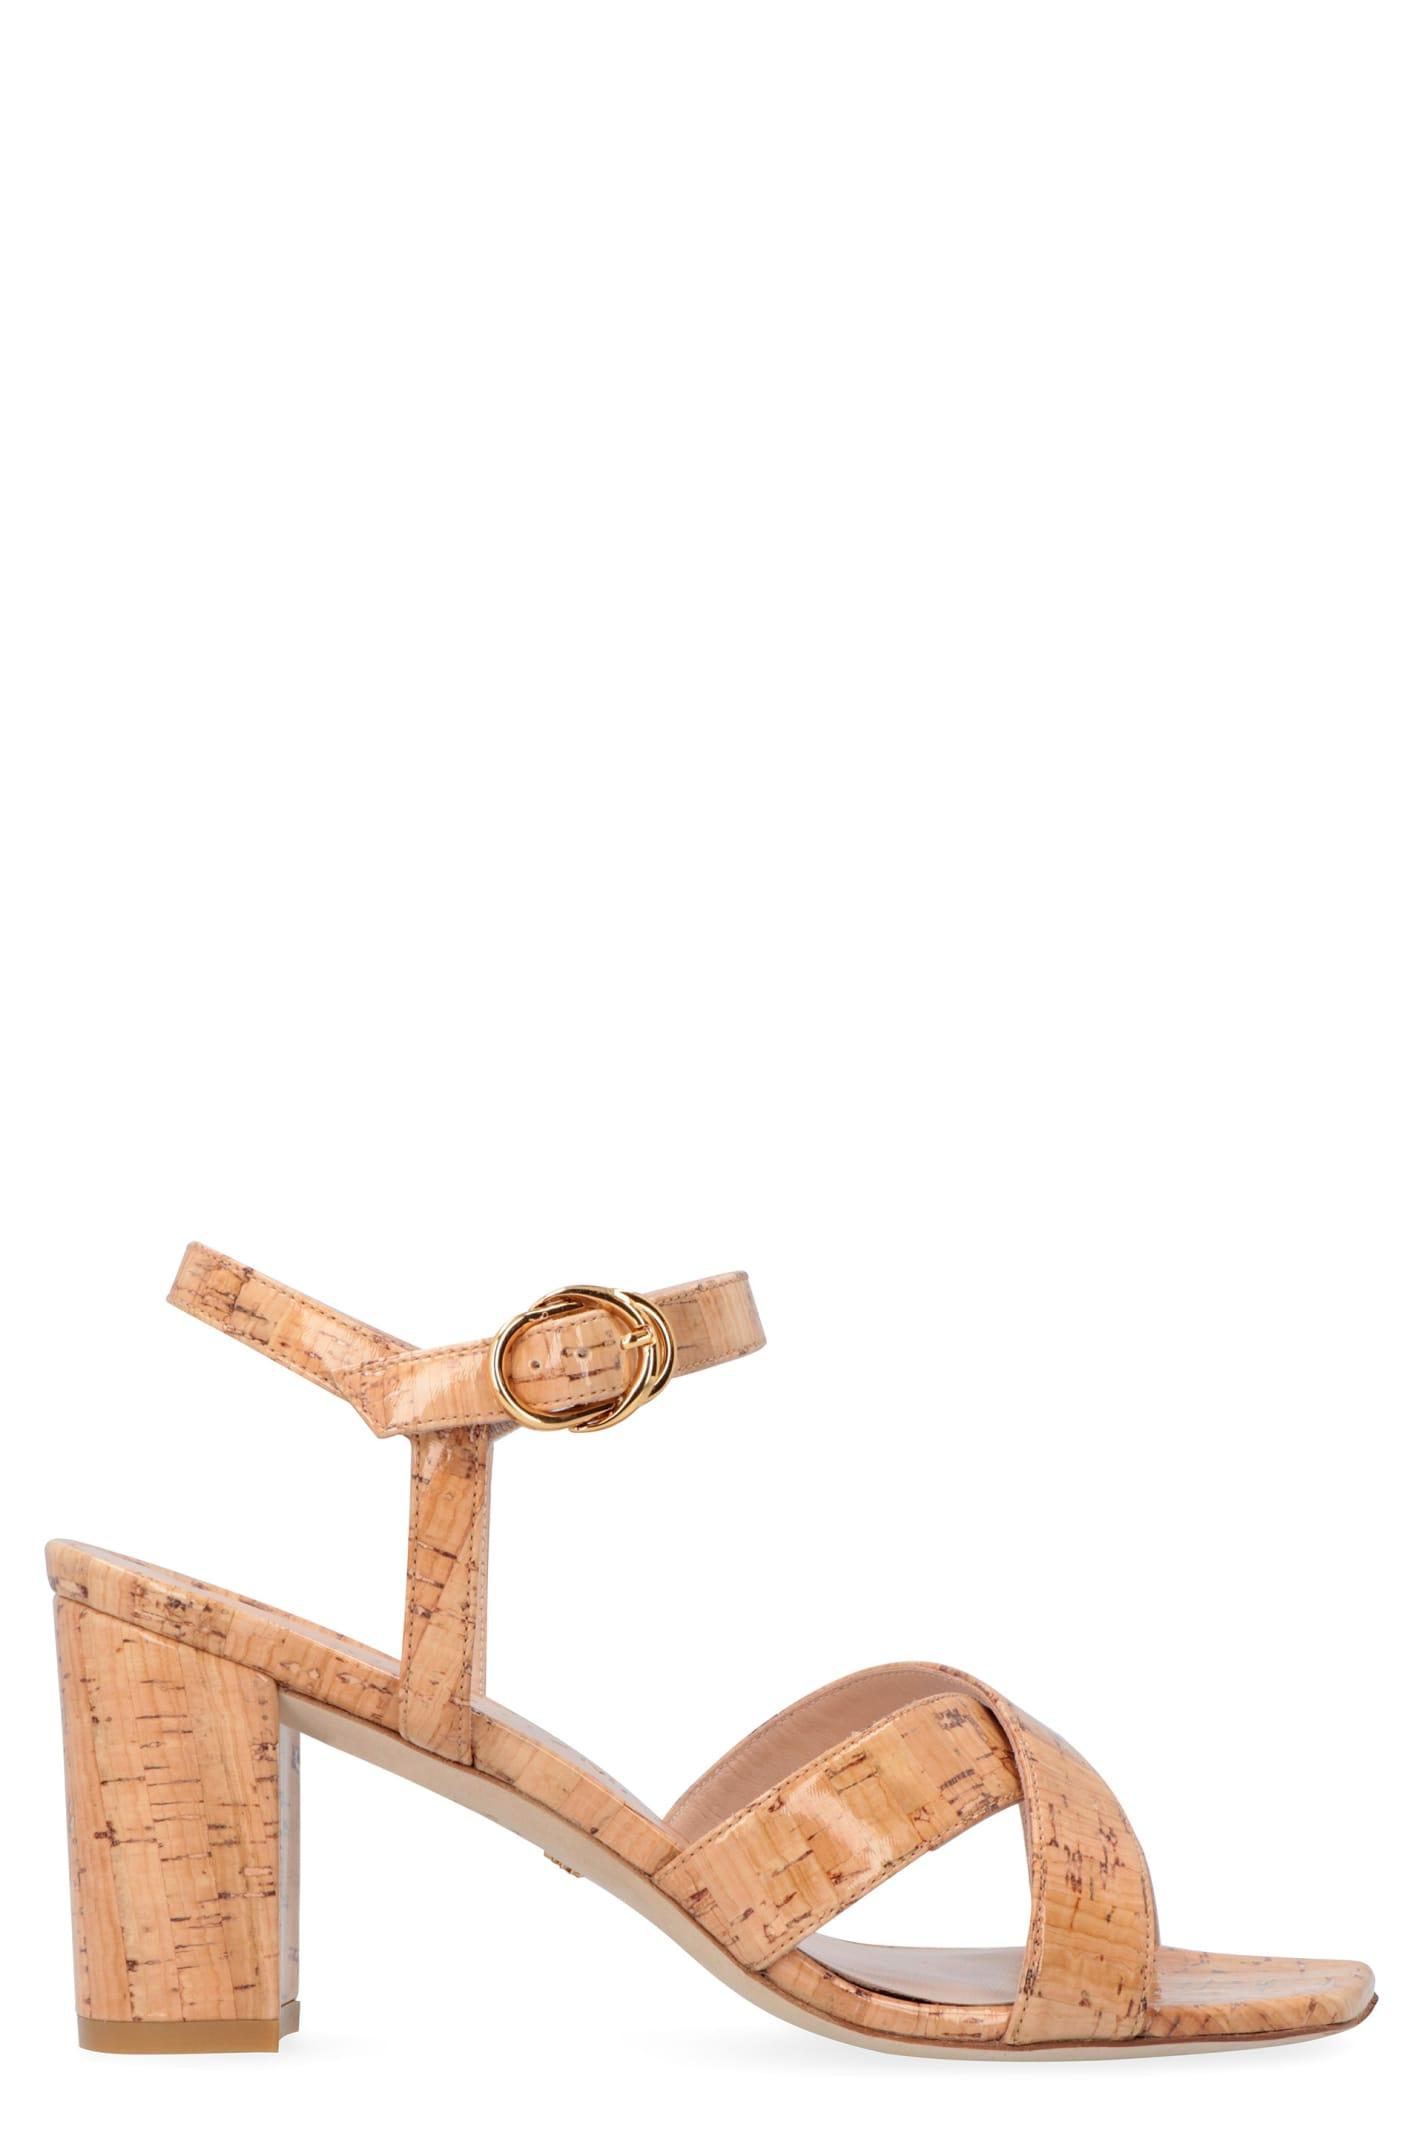 Buy Stuart Weitzman Analeigh Heeled Sandals online, shop Stuart Weitzman shoes with free shipping